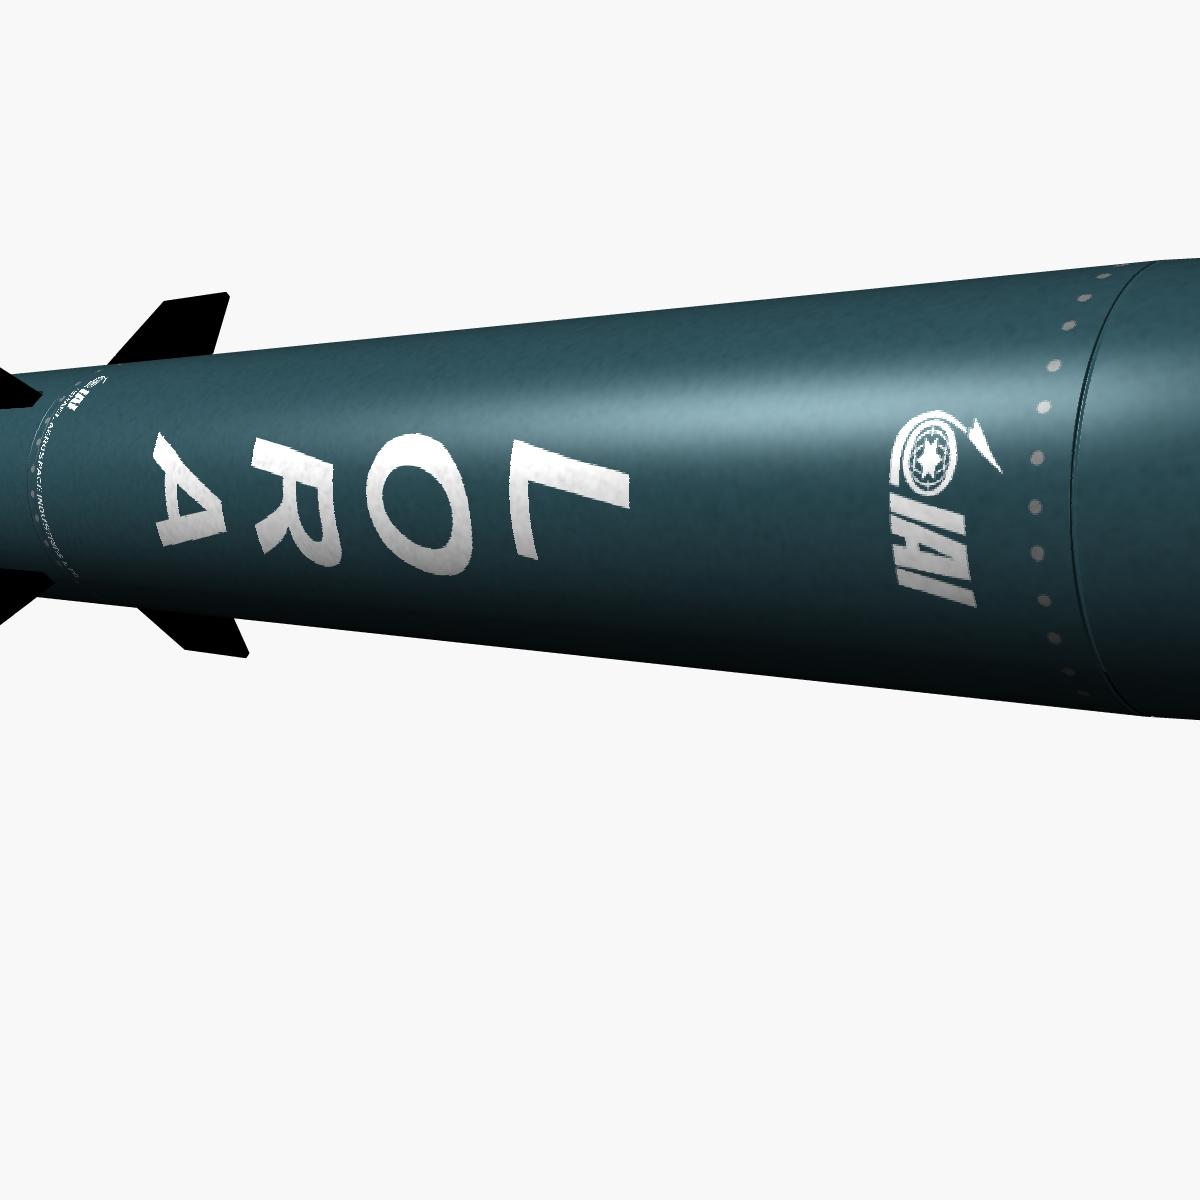 lora missile 3d model 3ds dxf fbx blend cob dae x obj 217679